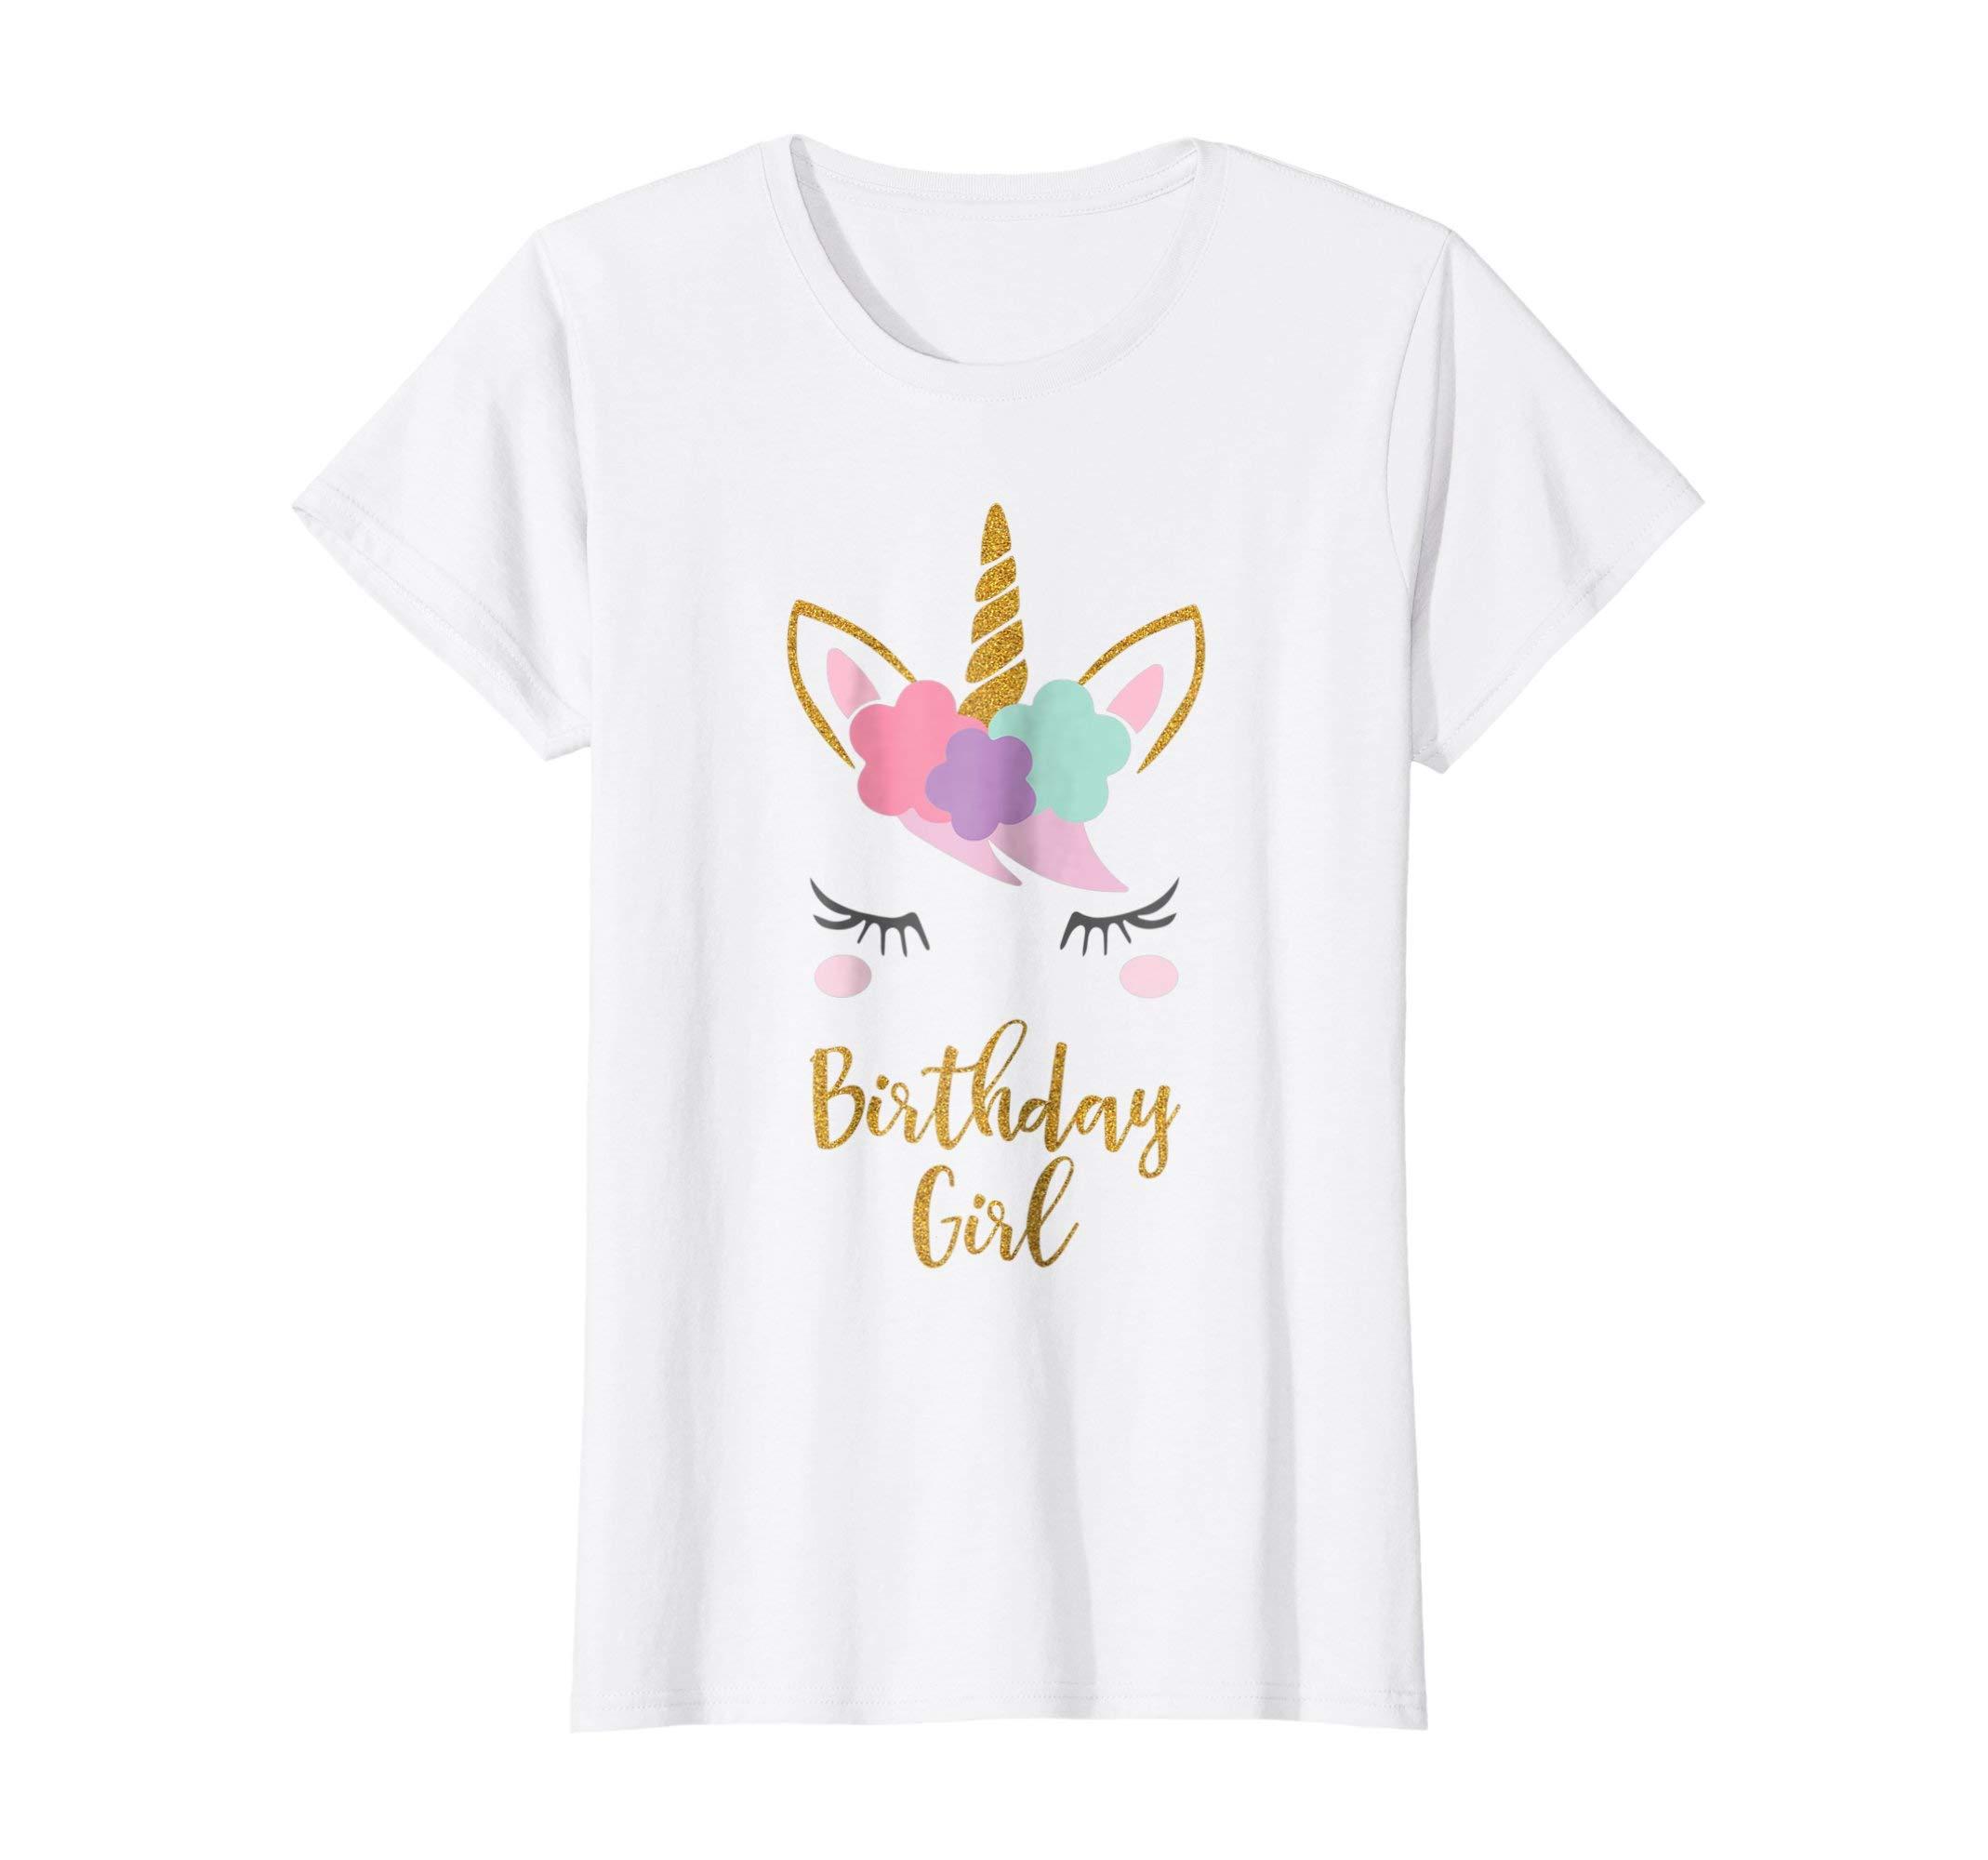 73b970dbcec89 Galleon - Womens Unicorn Birthday T-Shirt, Unicorn Gift, Birthday Outfit XL  White